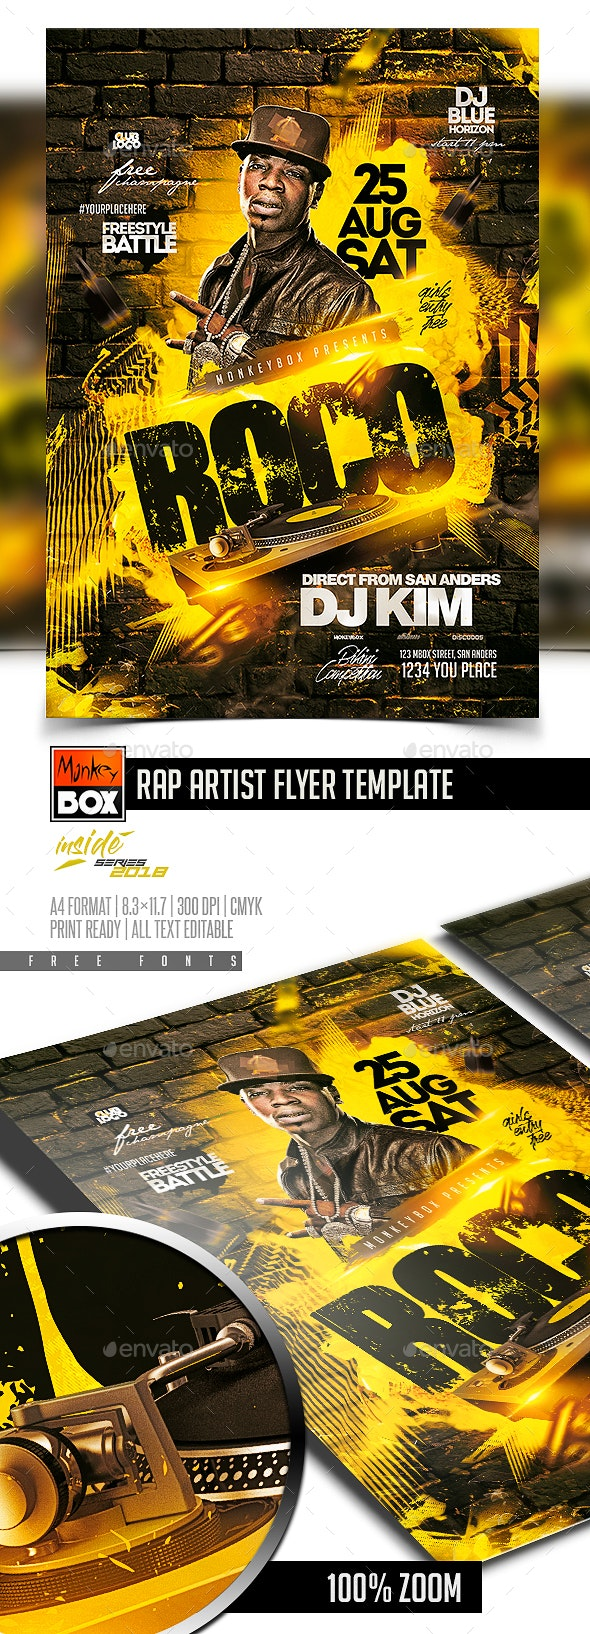 Rap Artist Flyer Template - Flyers Print Templates